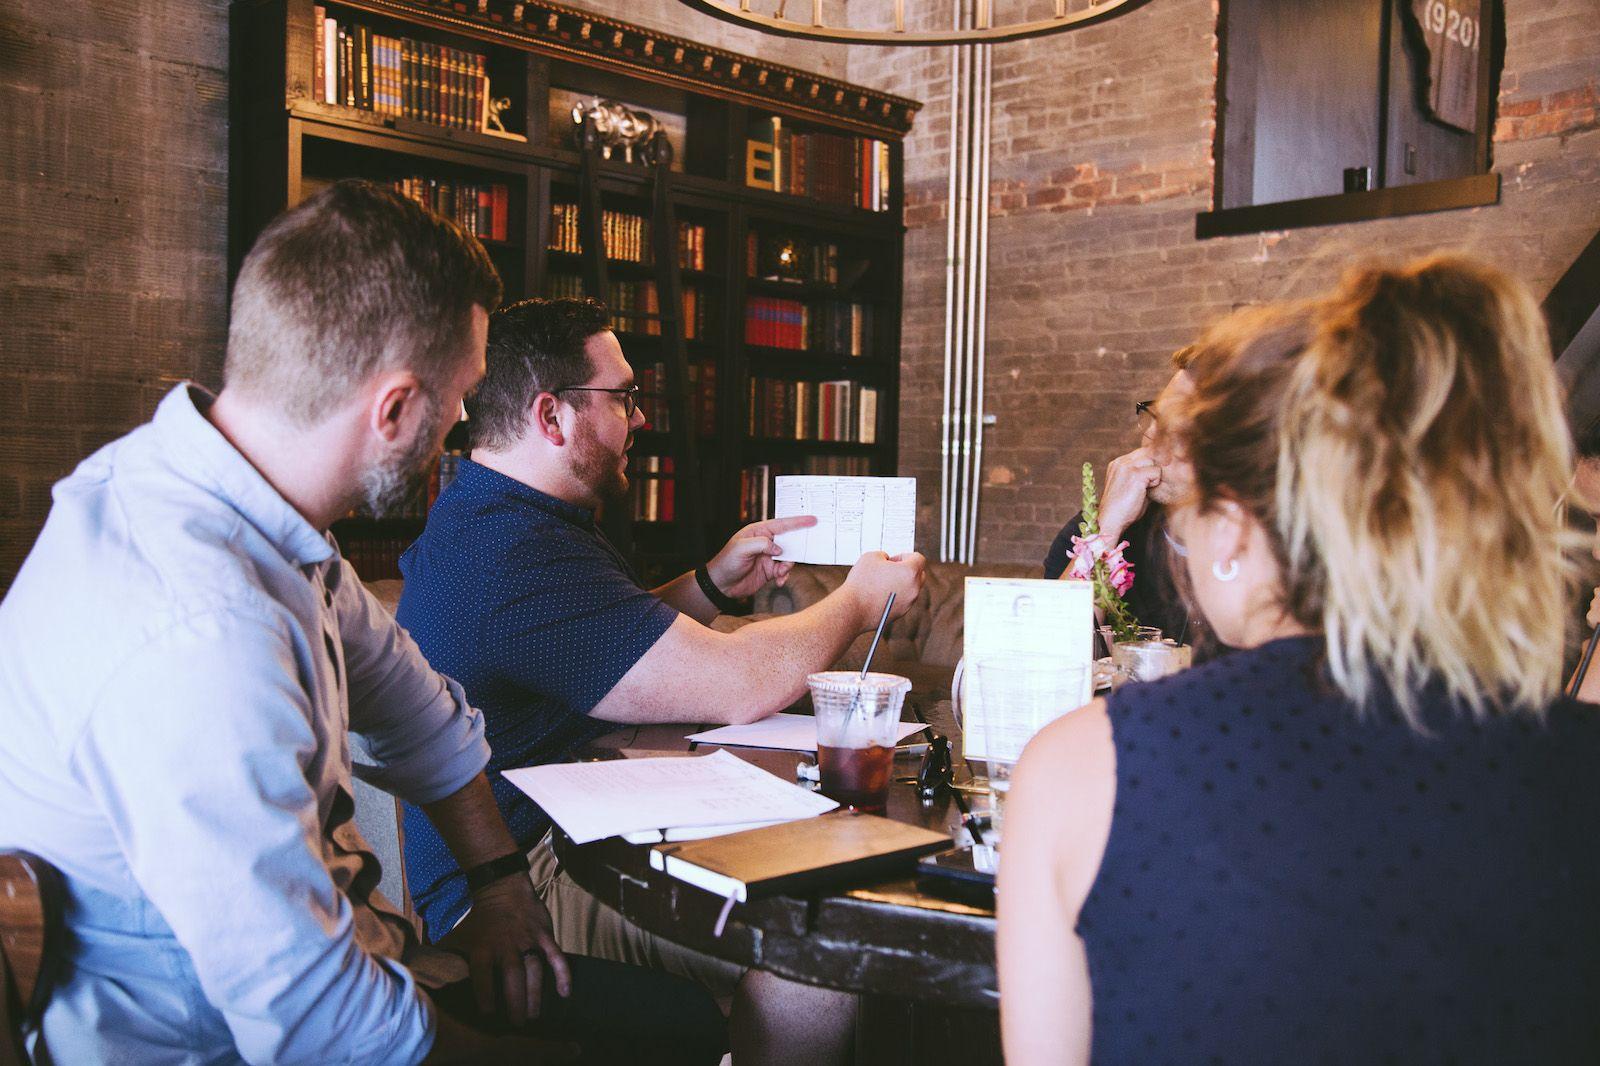 Design team presenting wireframes in coffee shop